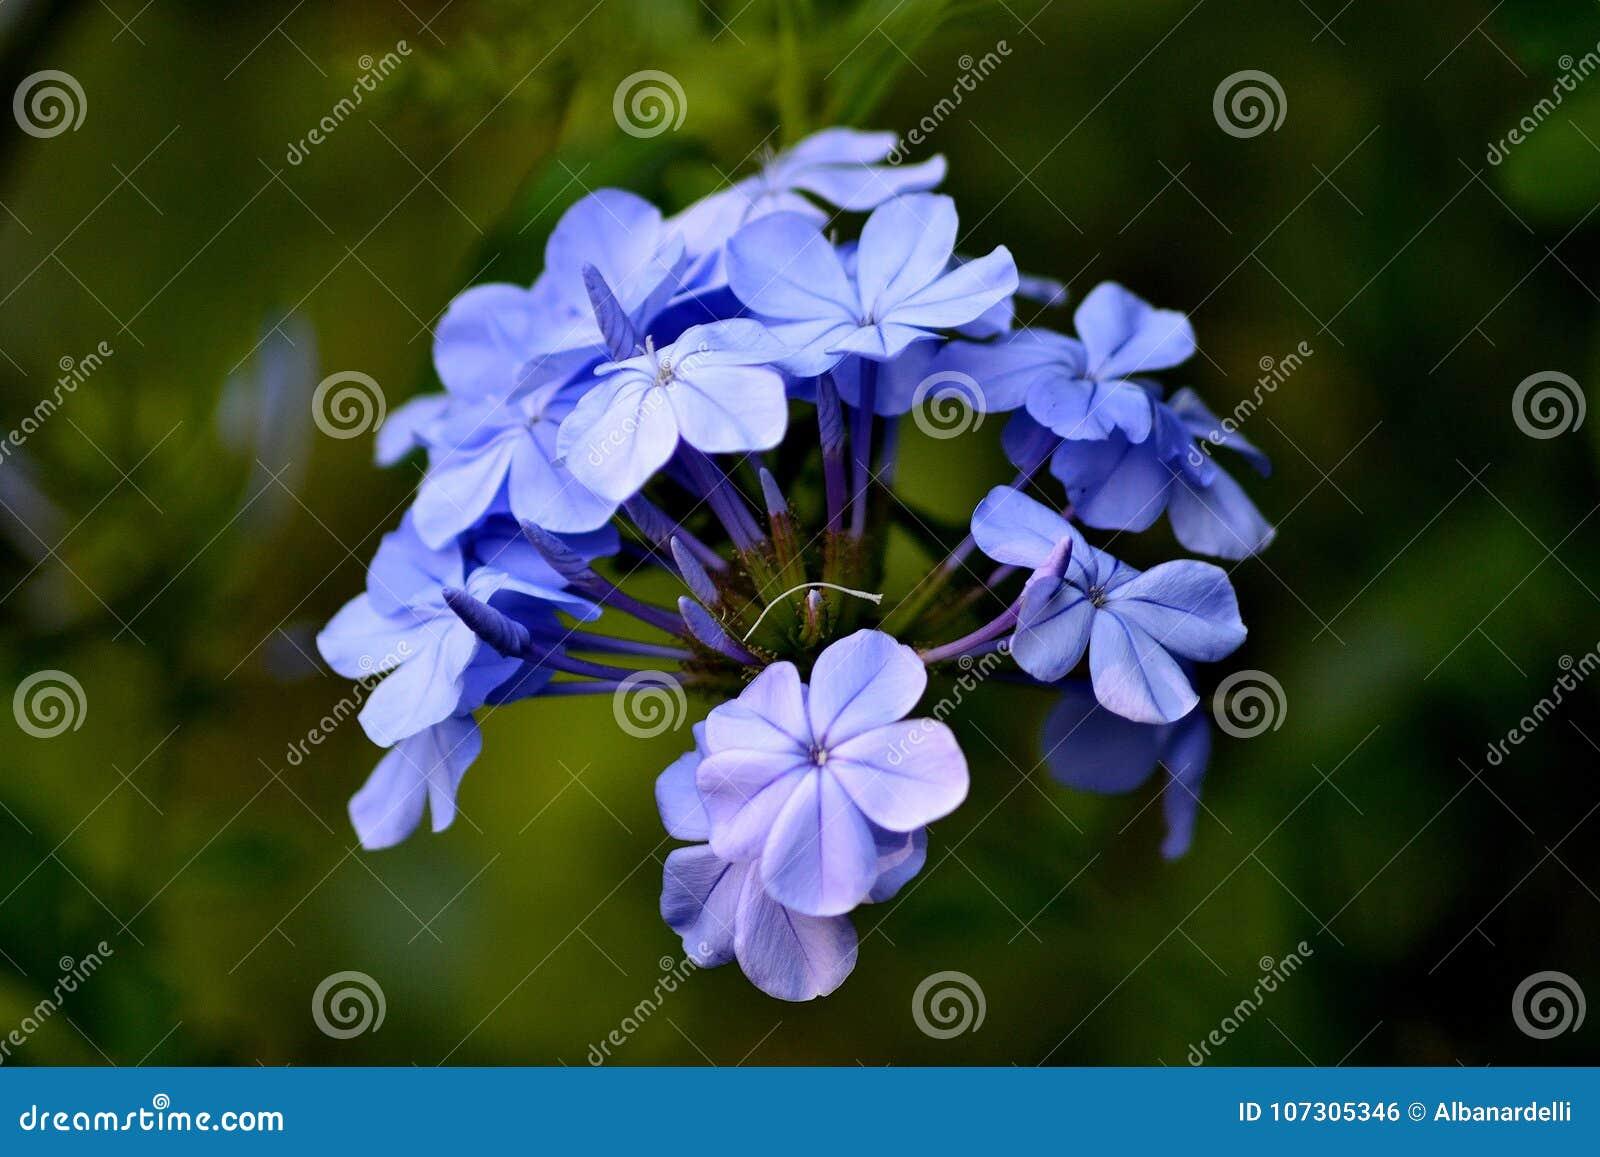 Beautiful little violet jasmine flower stock photo image of blue beautiful little violet jasmine flower izmirmasajfo